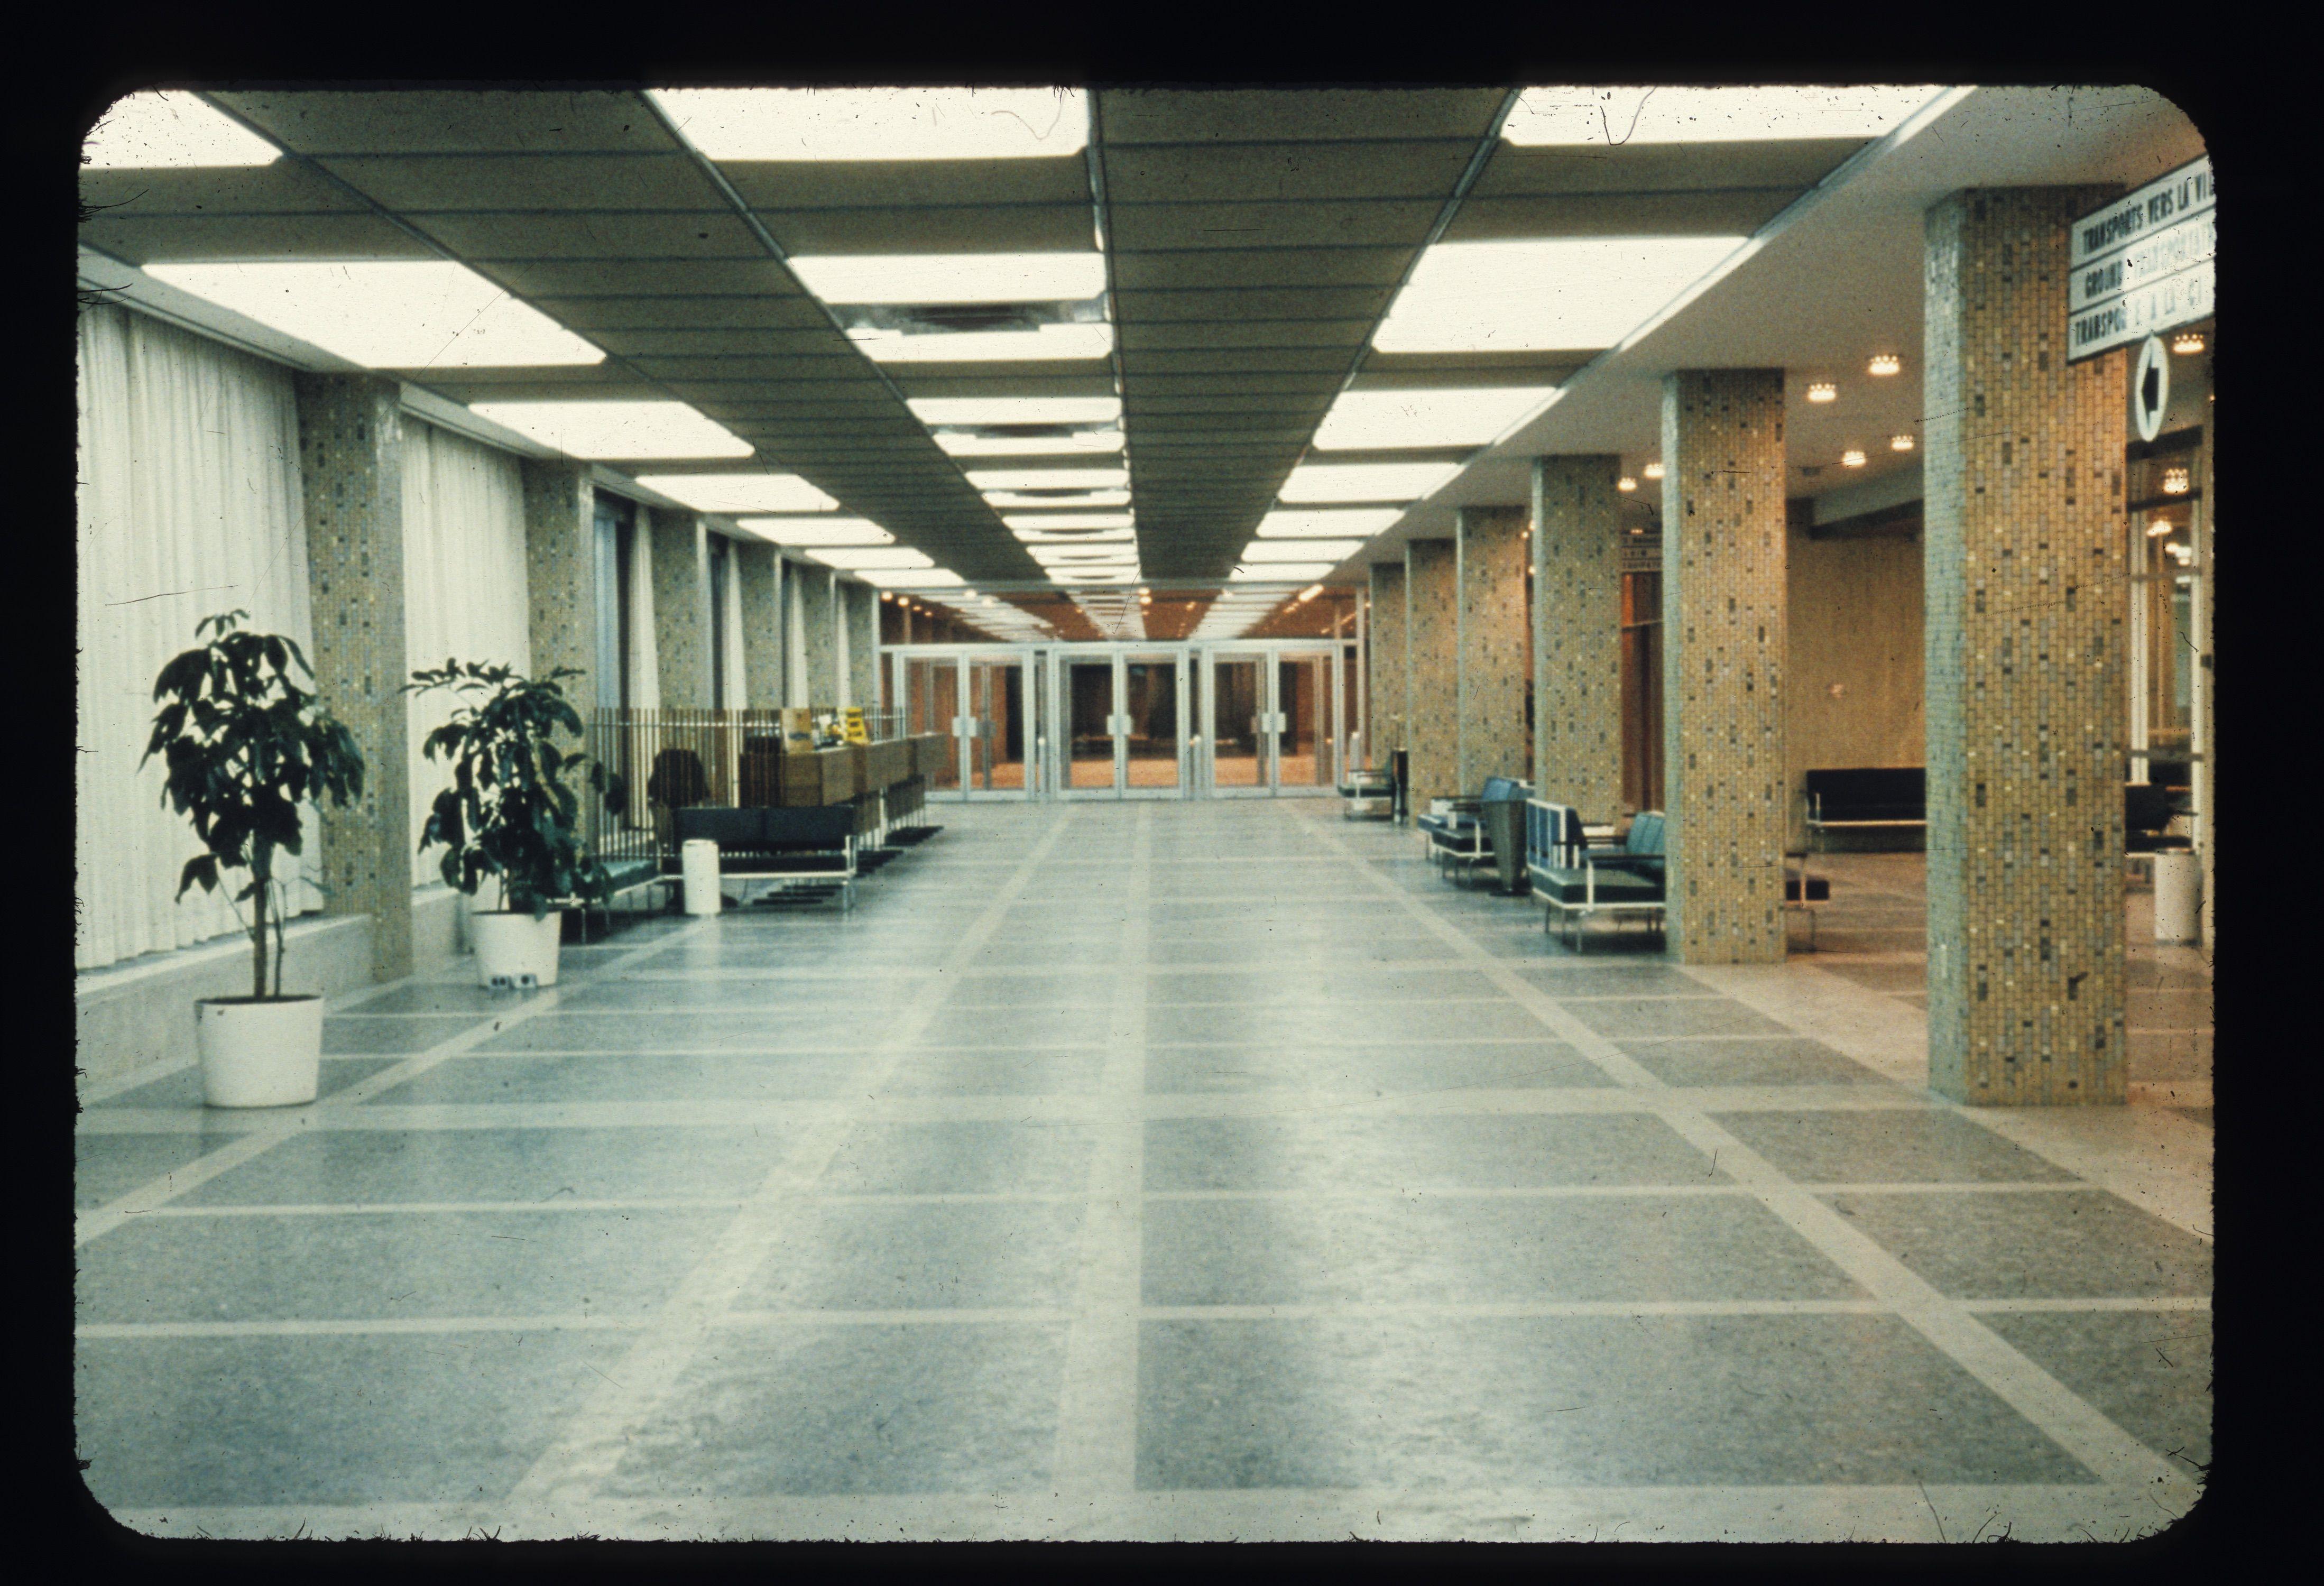 Montreals dorval airport lounge interior design by gsm 1958 montreals dorval airport lounge interior design by gsm solutioingenieria Images